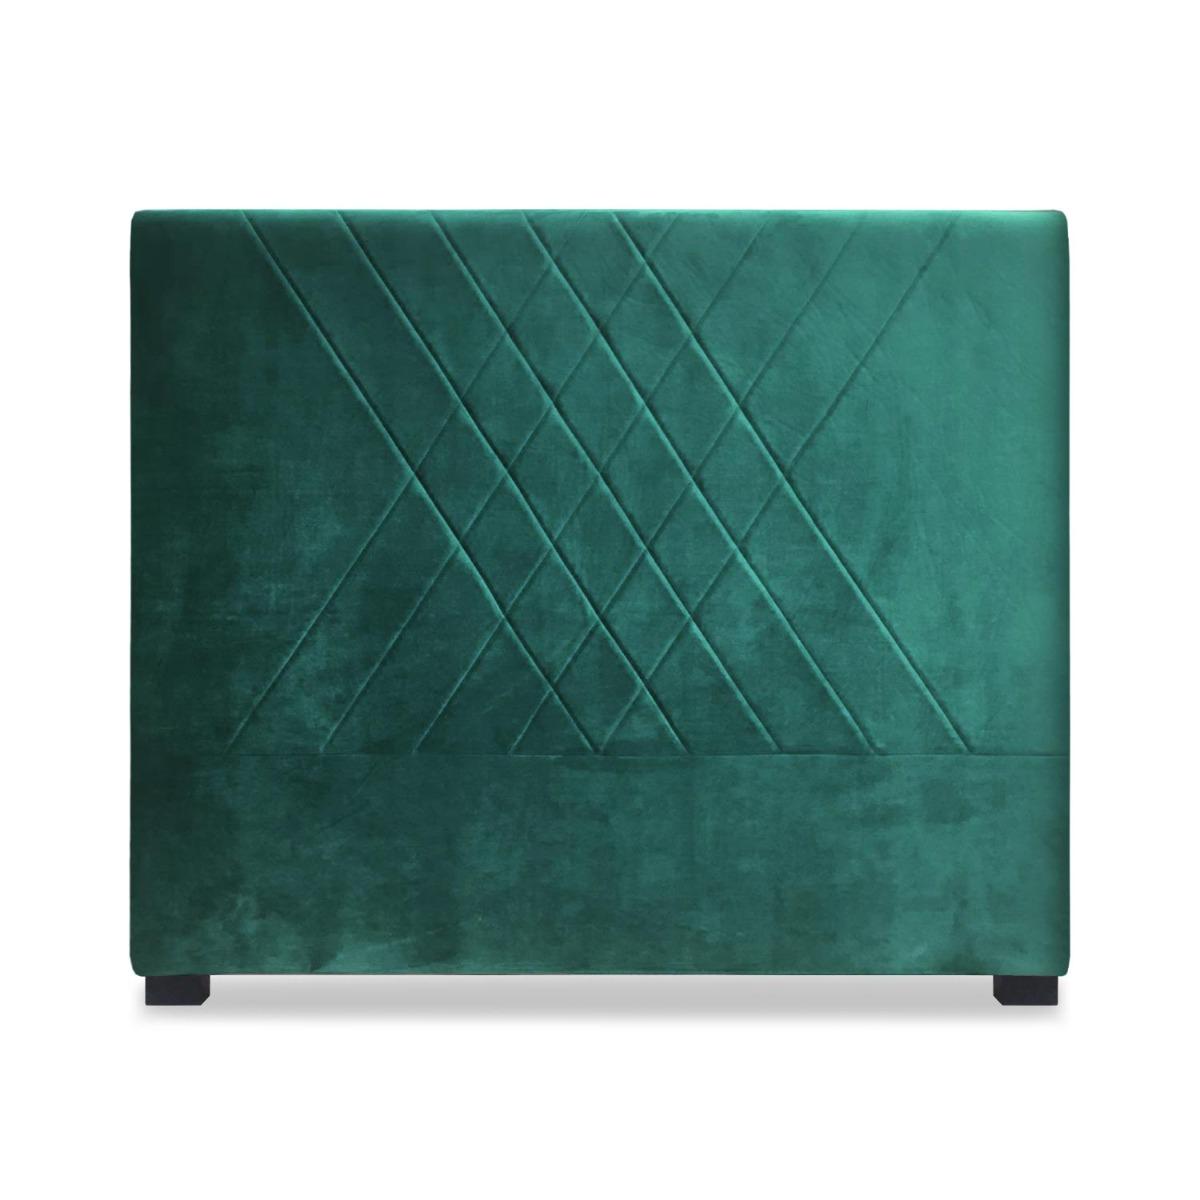 Tête de lit Diam 140cm Velours Vert